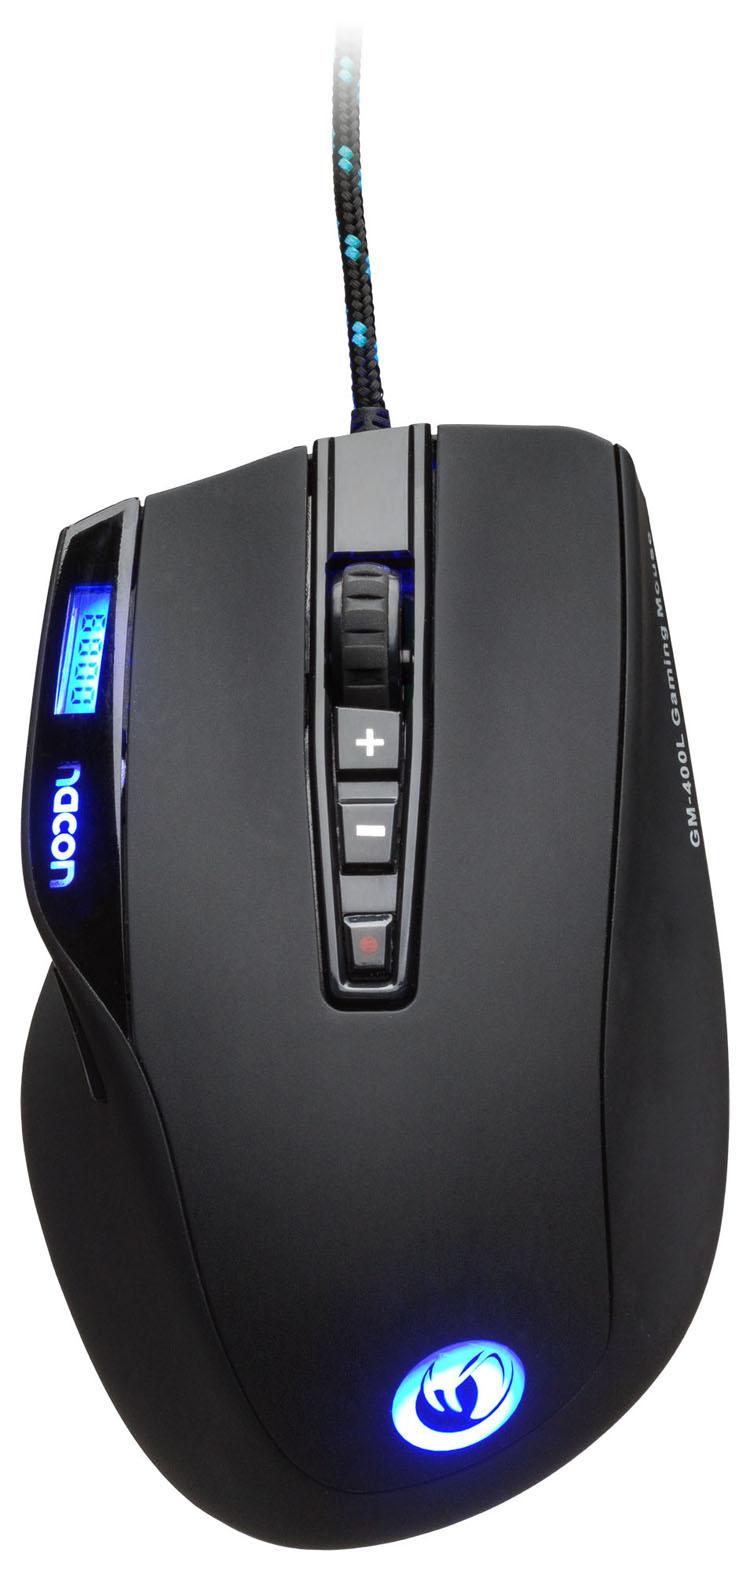 NACON Laser gaming mouse - Image   #2